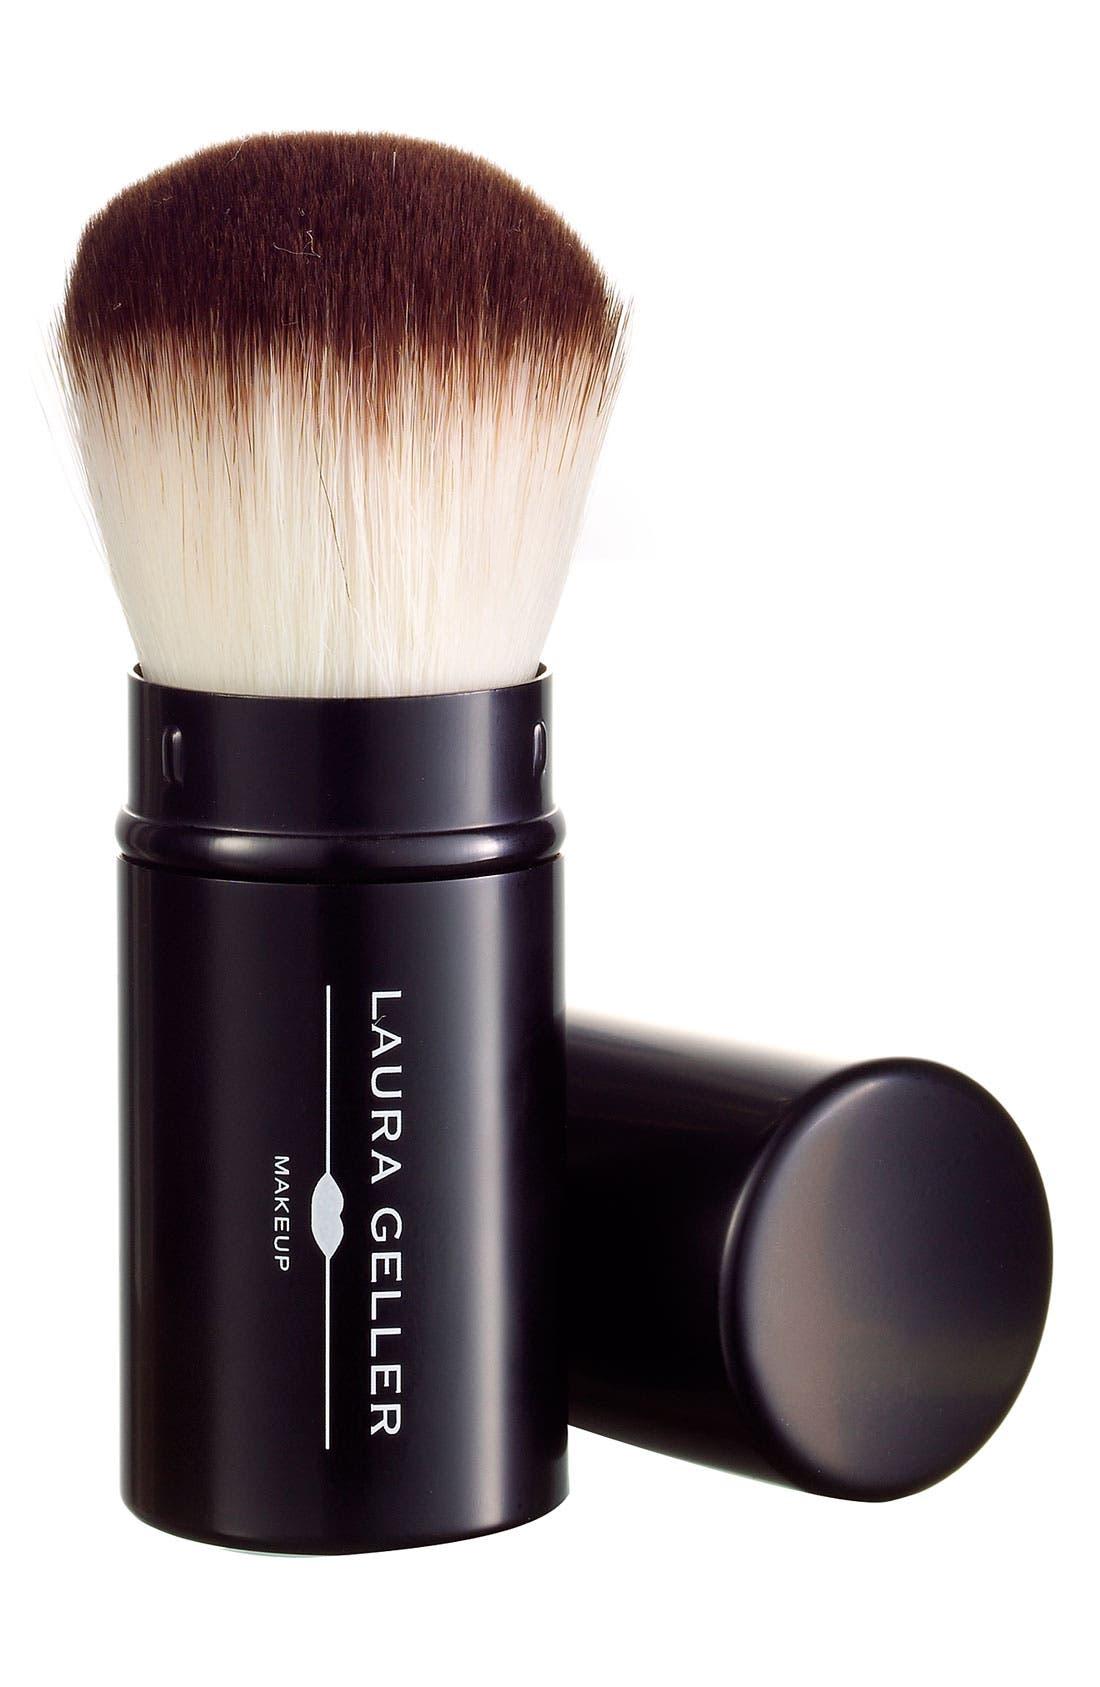 Laura Geller Beauty Retractable Kabuki Brush